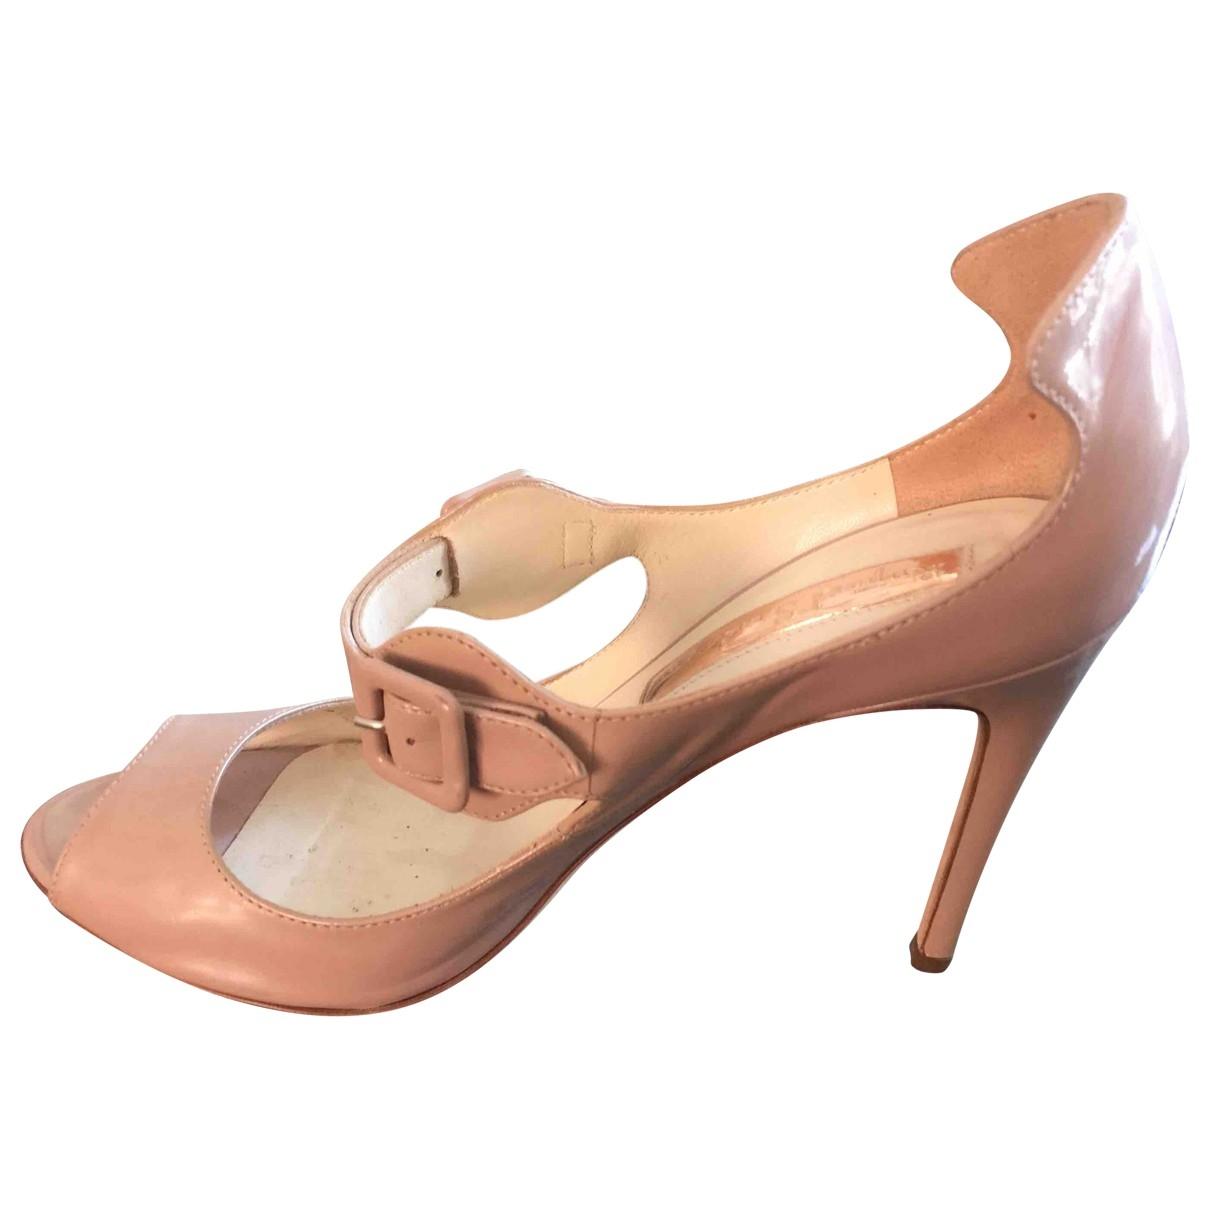 Rupert Sanderson \N Beige Patent leather Sandals for Women 38 EU